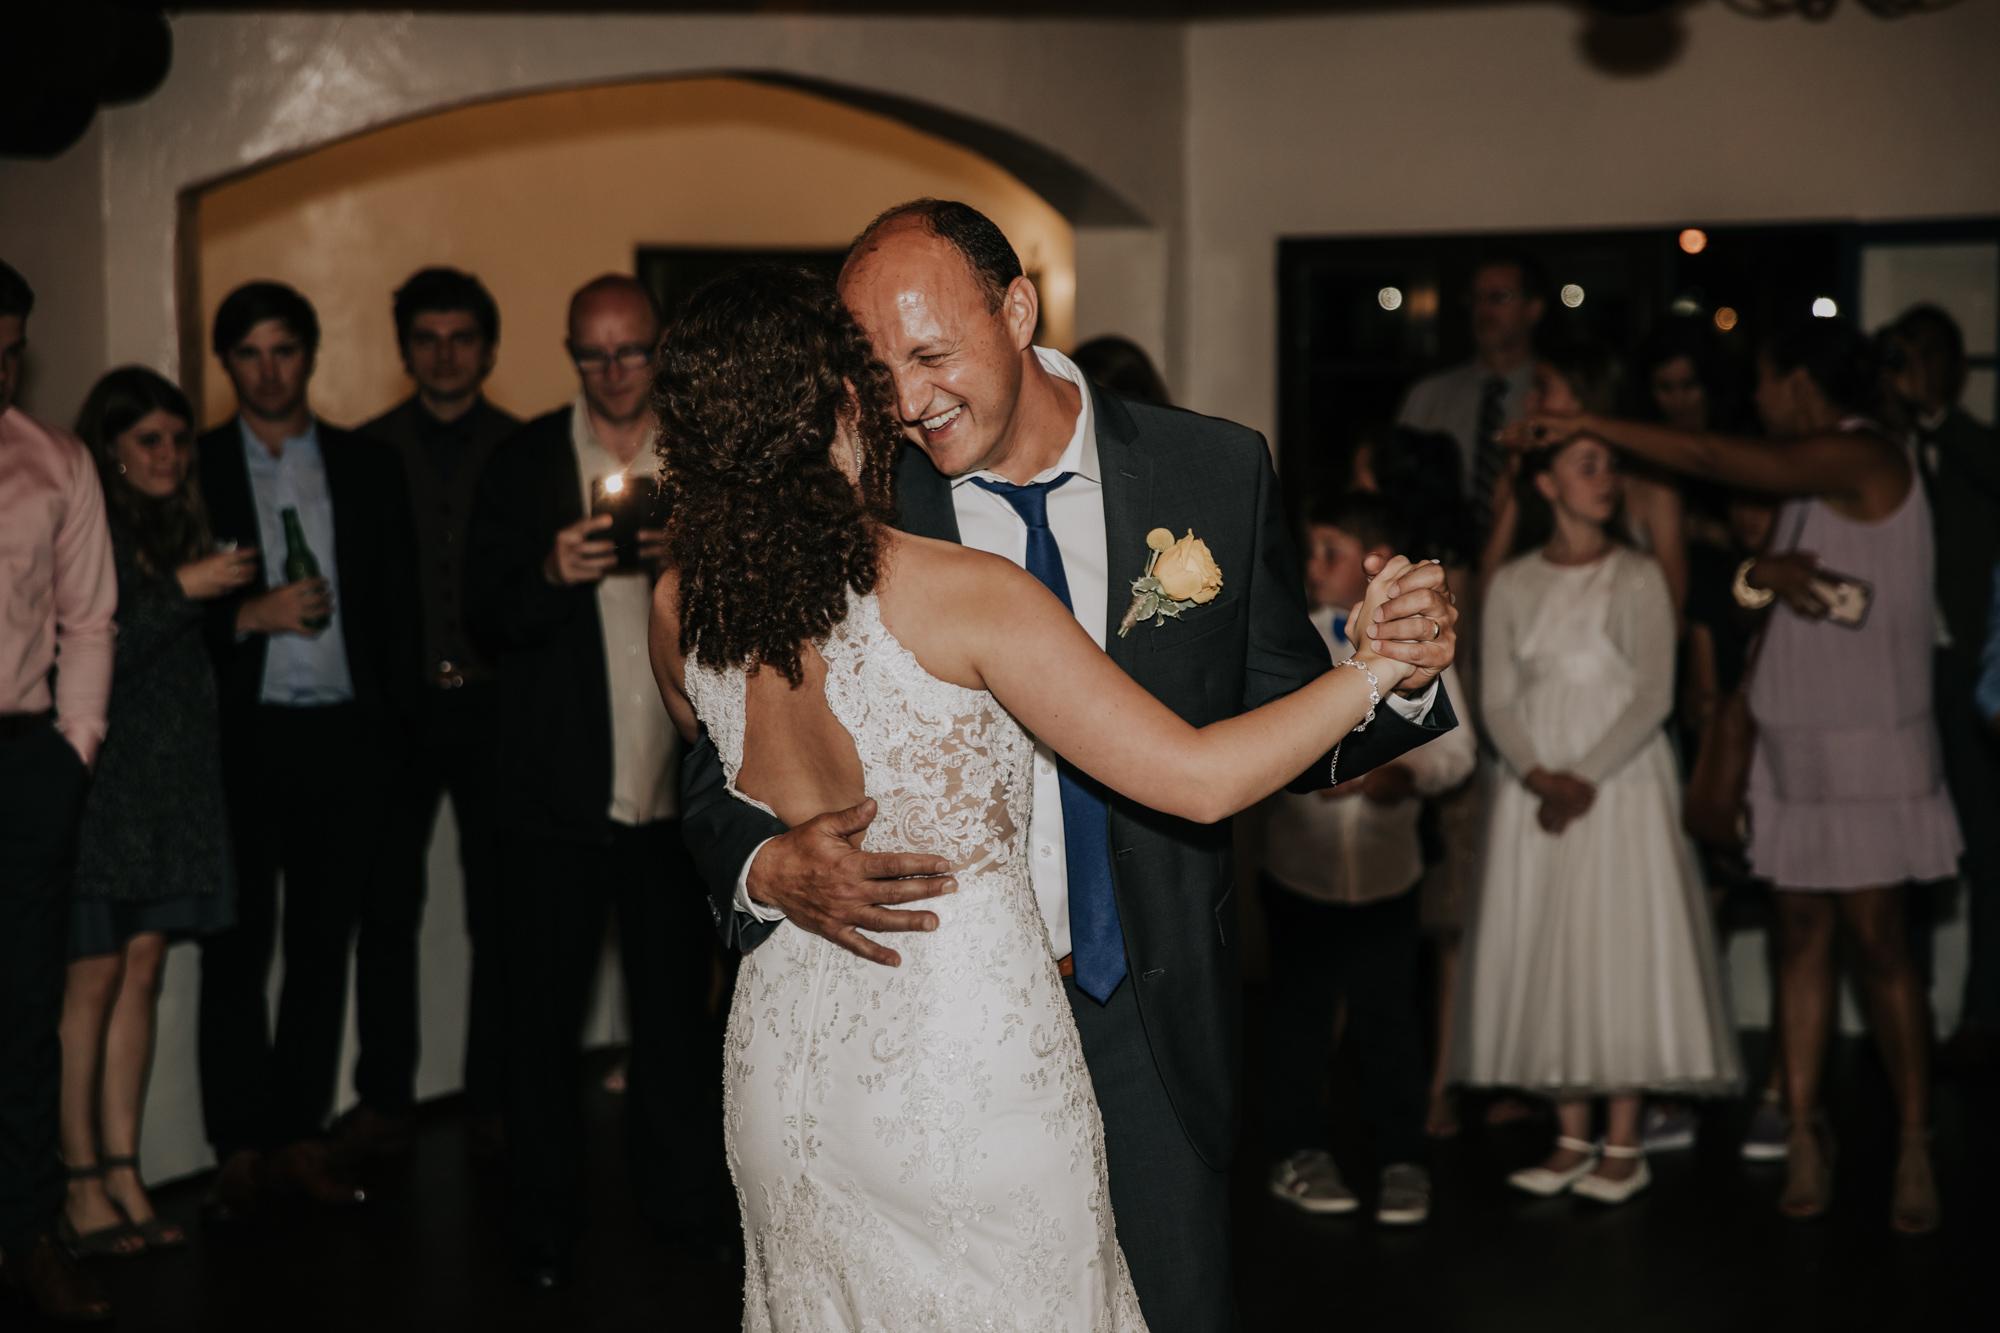 150-destination-wedding-san-clemente-california.jpg